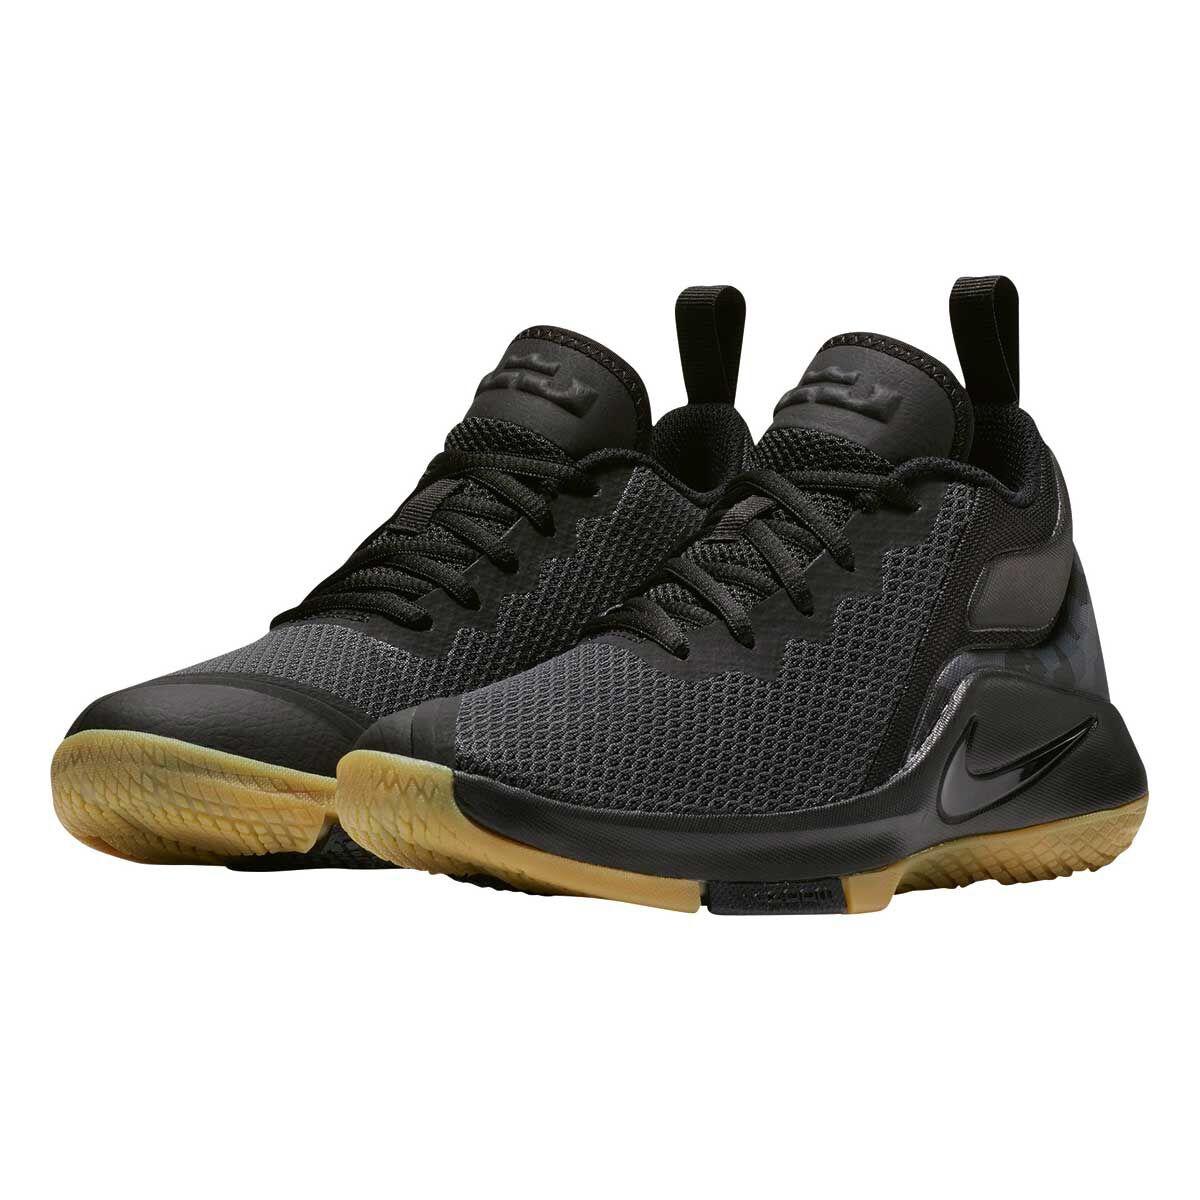 377117150d1a ... shop nike lebron witness ii boys basketball shoes black brown us 4  black brown e0fc5 42457